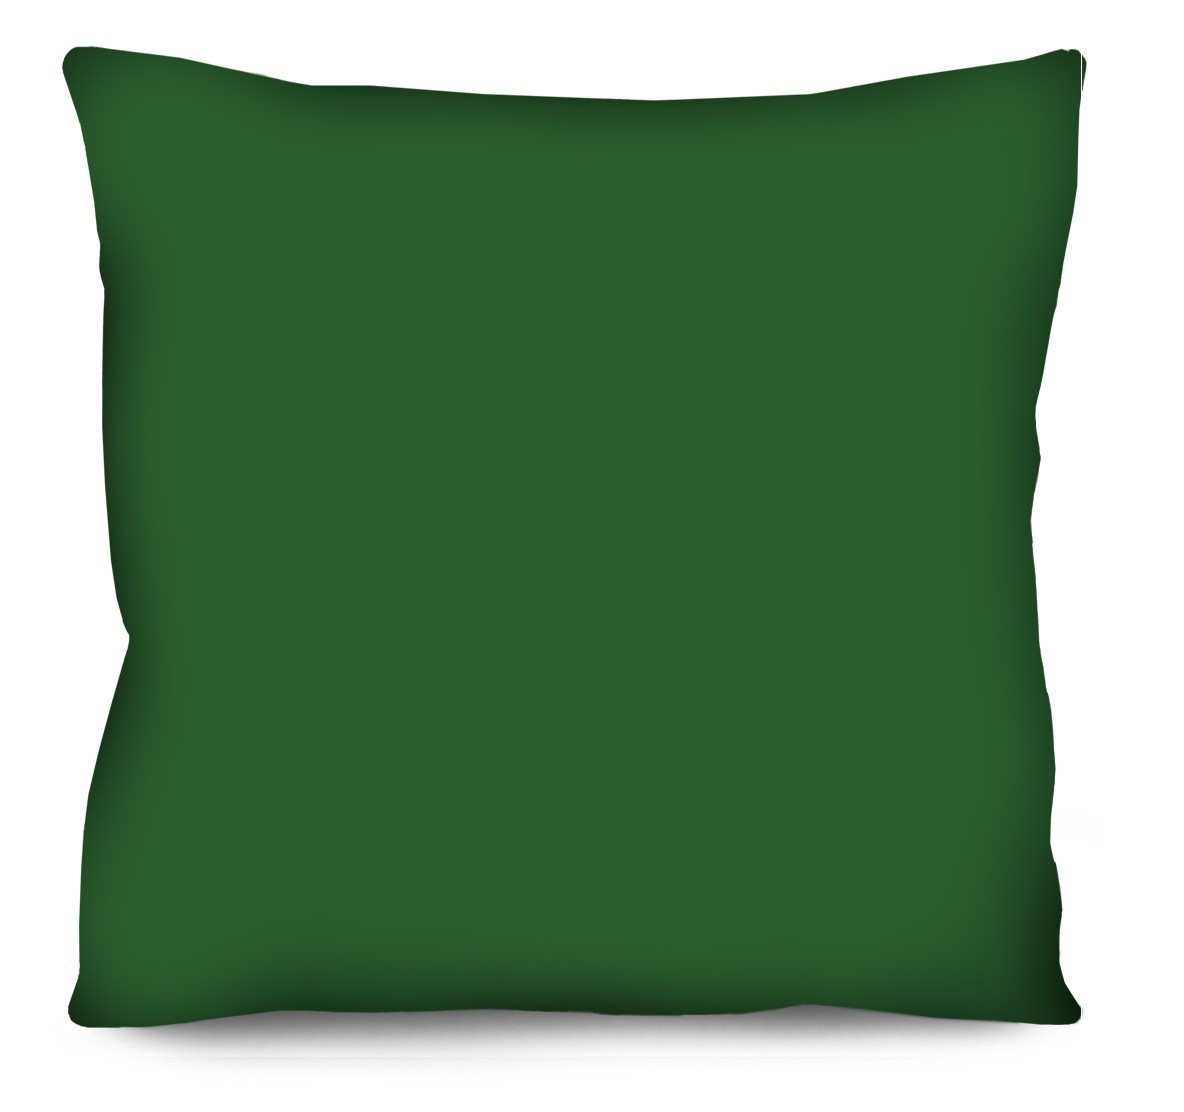 Capa de Almofada Acetinada Lisa Verde Escuro  50x50